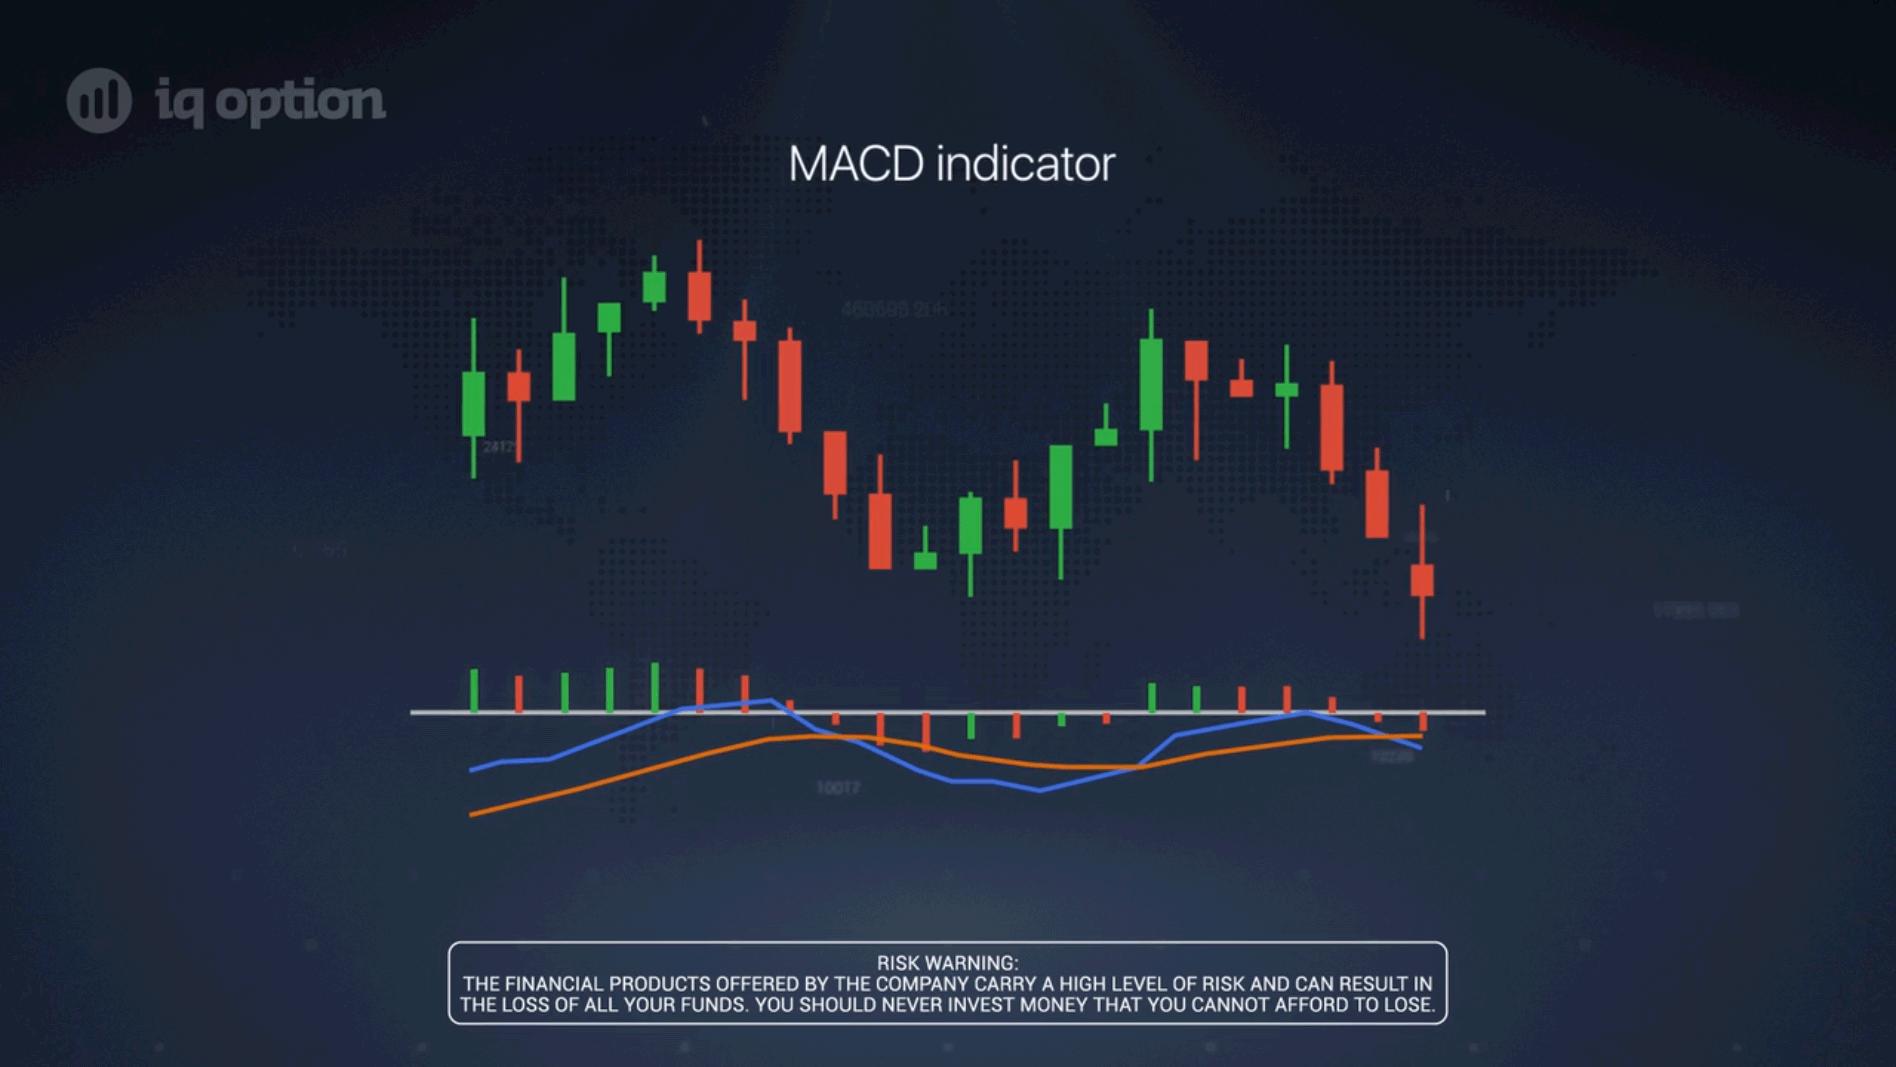 IqOption - MACD Indicator